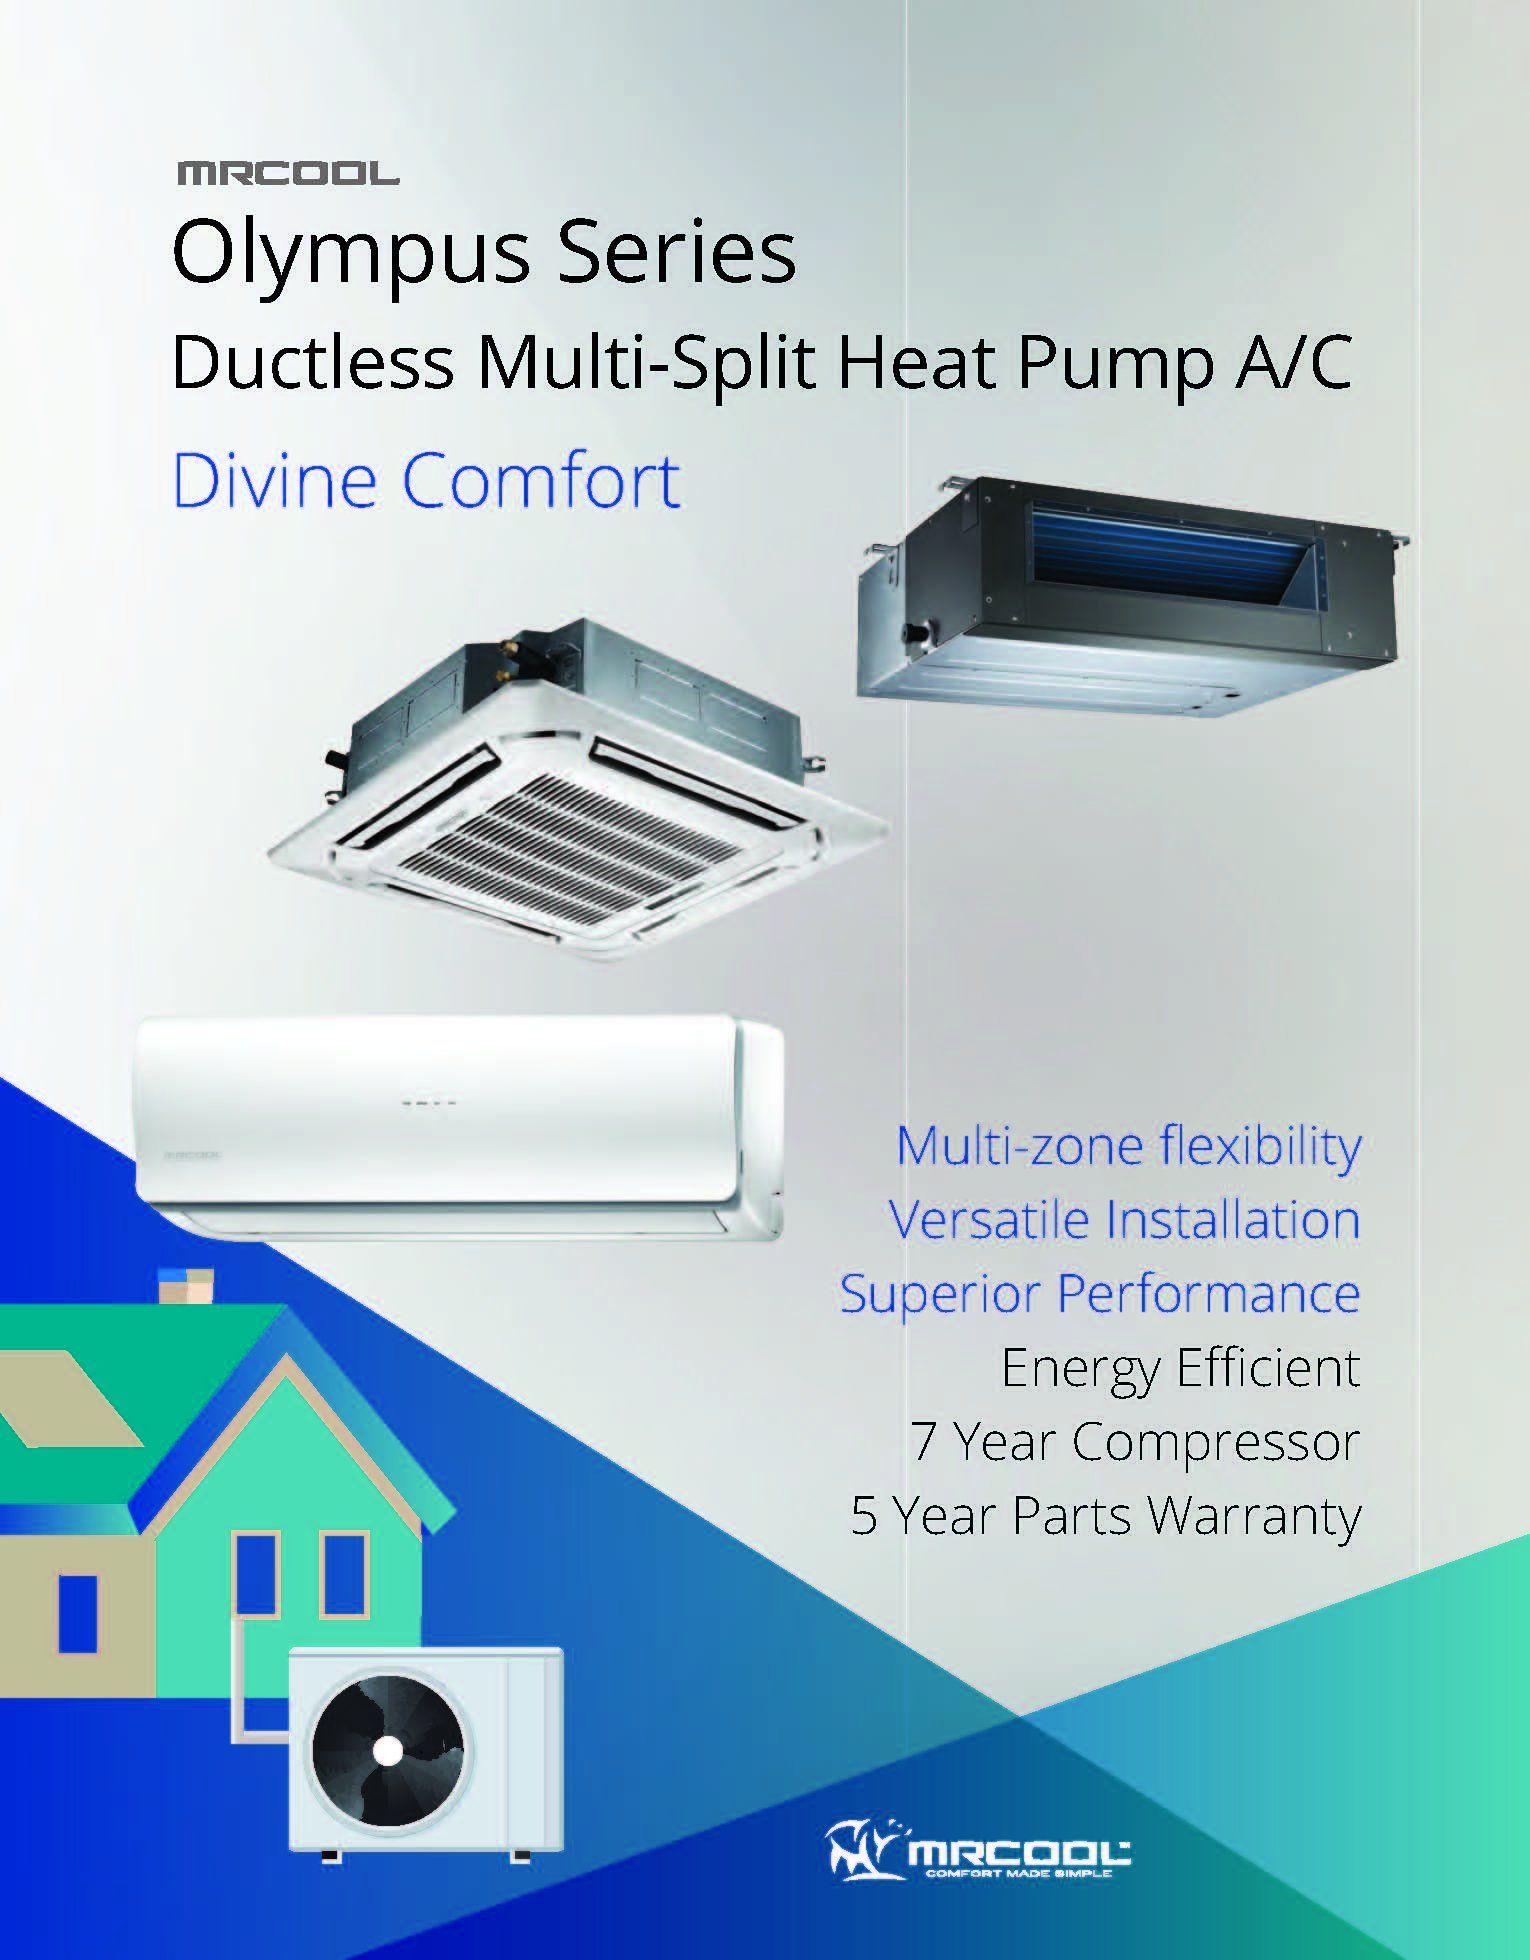 MRCOOL Olympus 36K BTU 3Zone Ductless MiniSplit Heat Pump